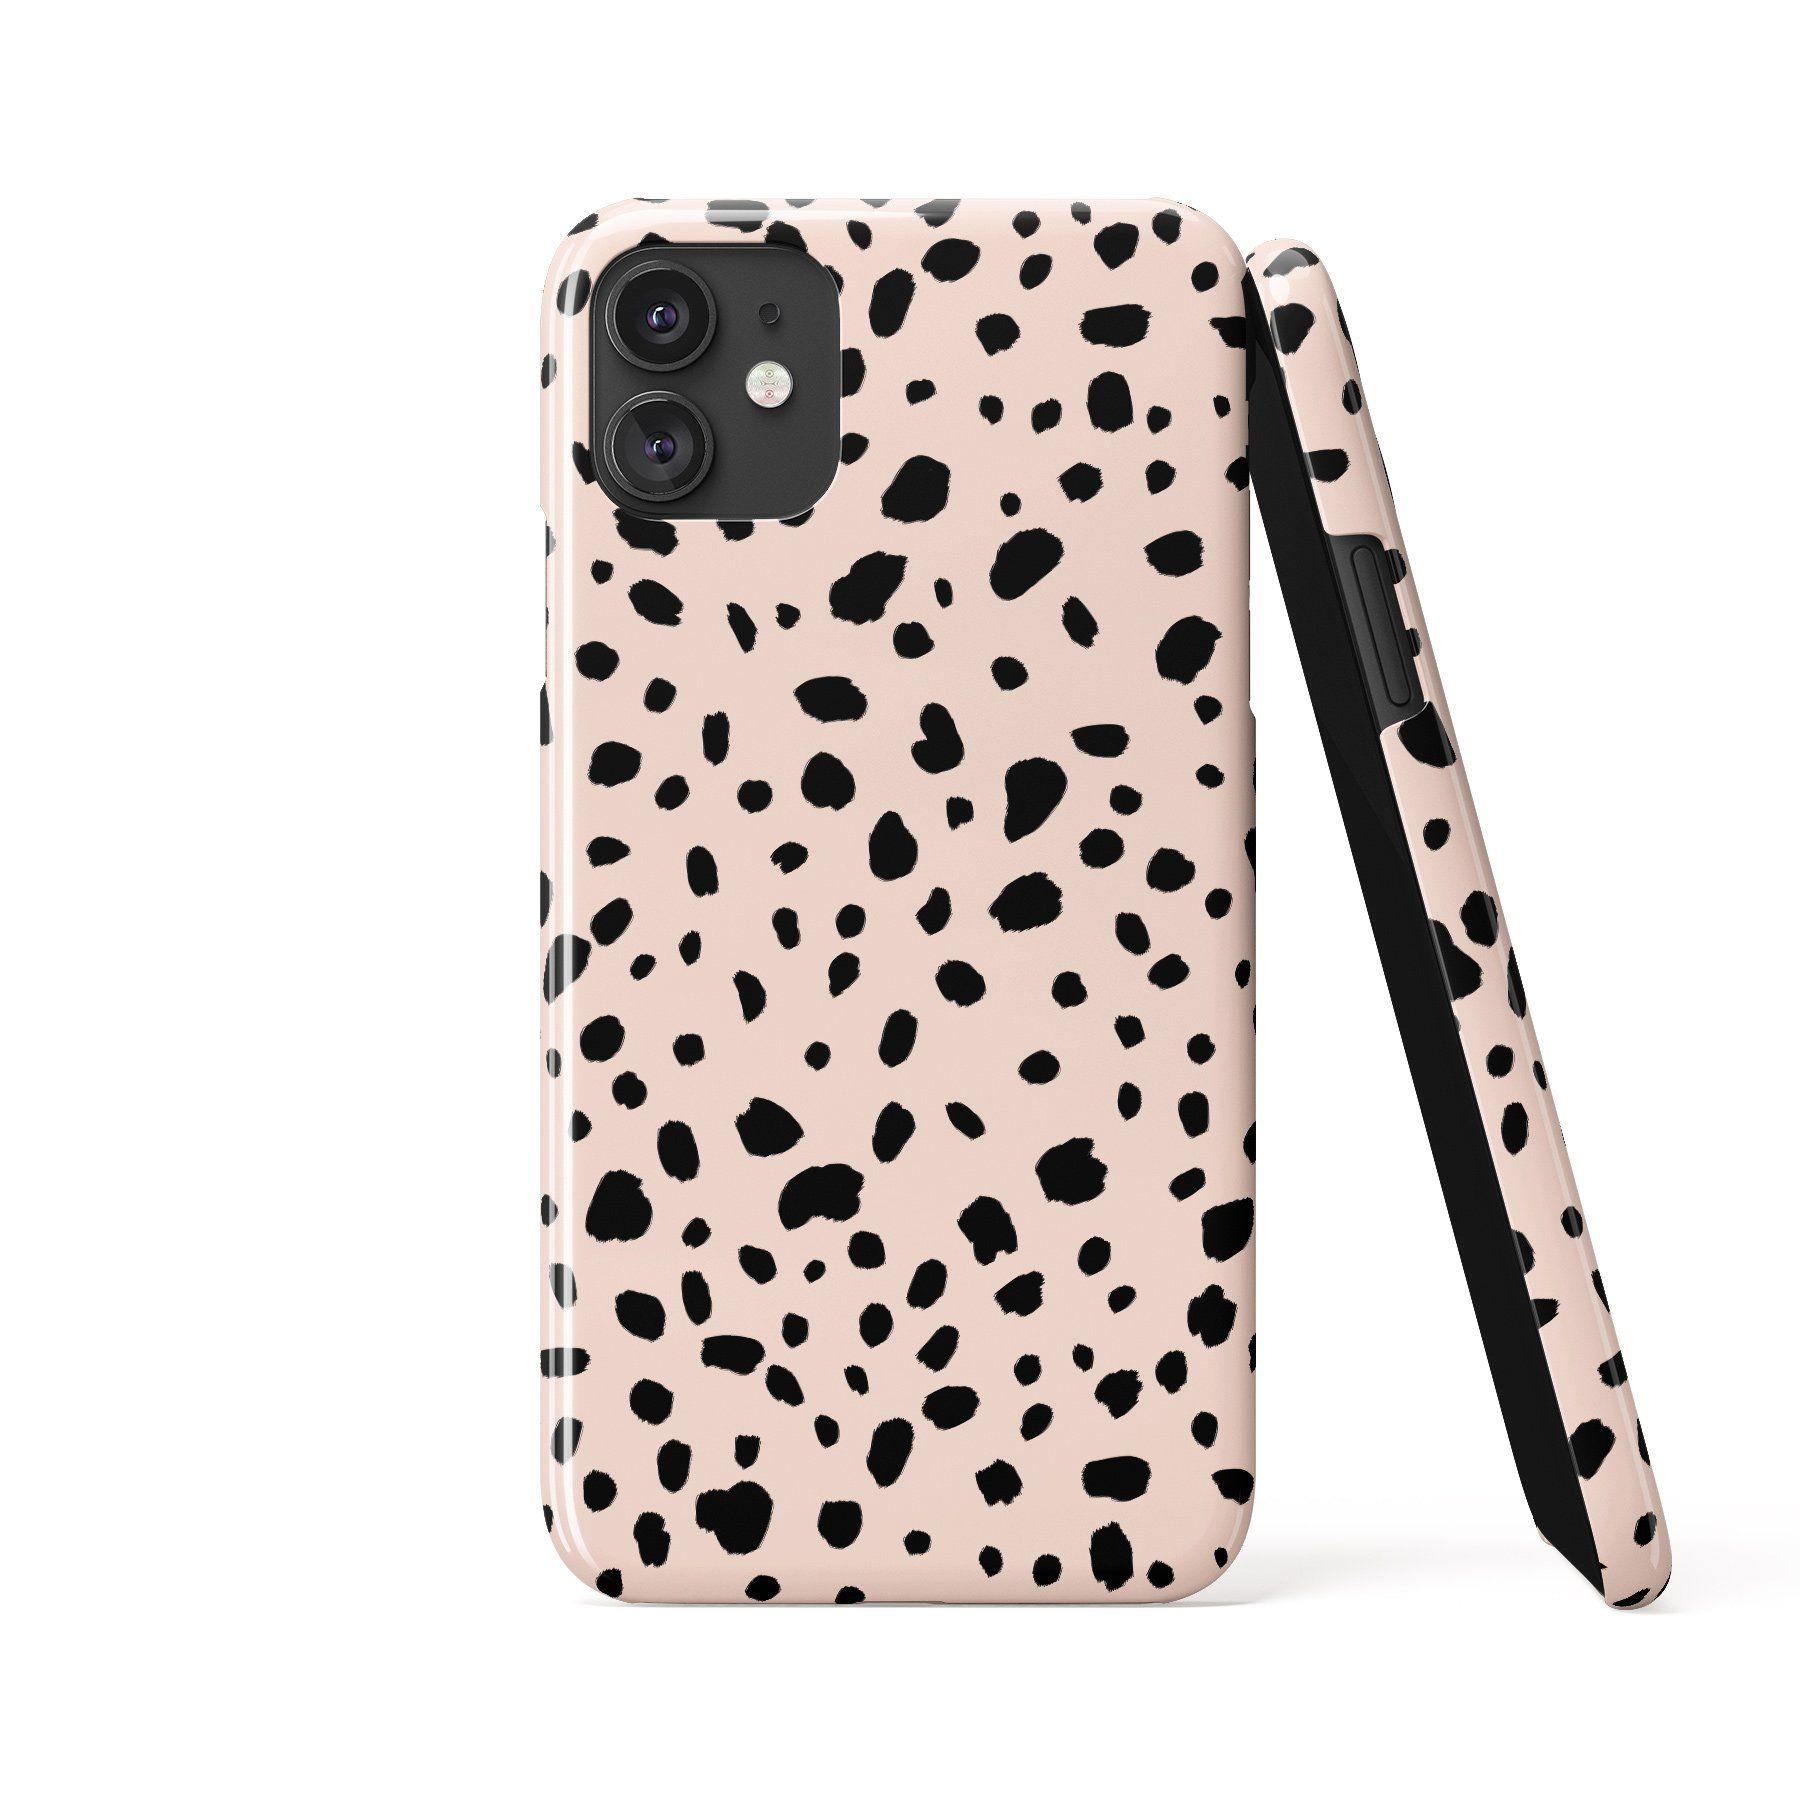 DALMATIAN SPOTS Blush Phone Case - iPhone 11 Pro / Tough Case - Gloss